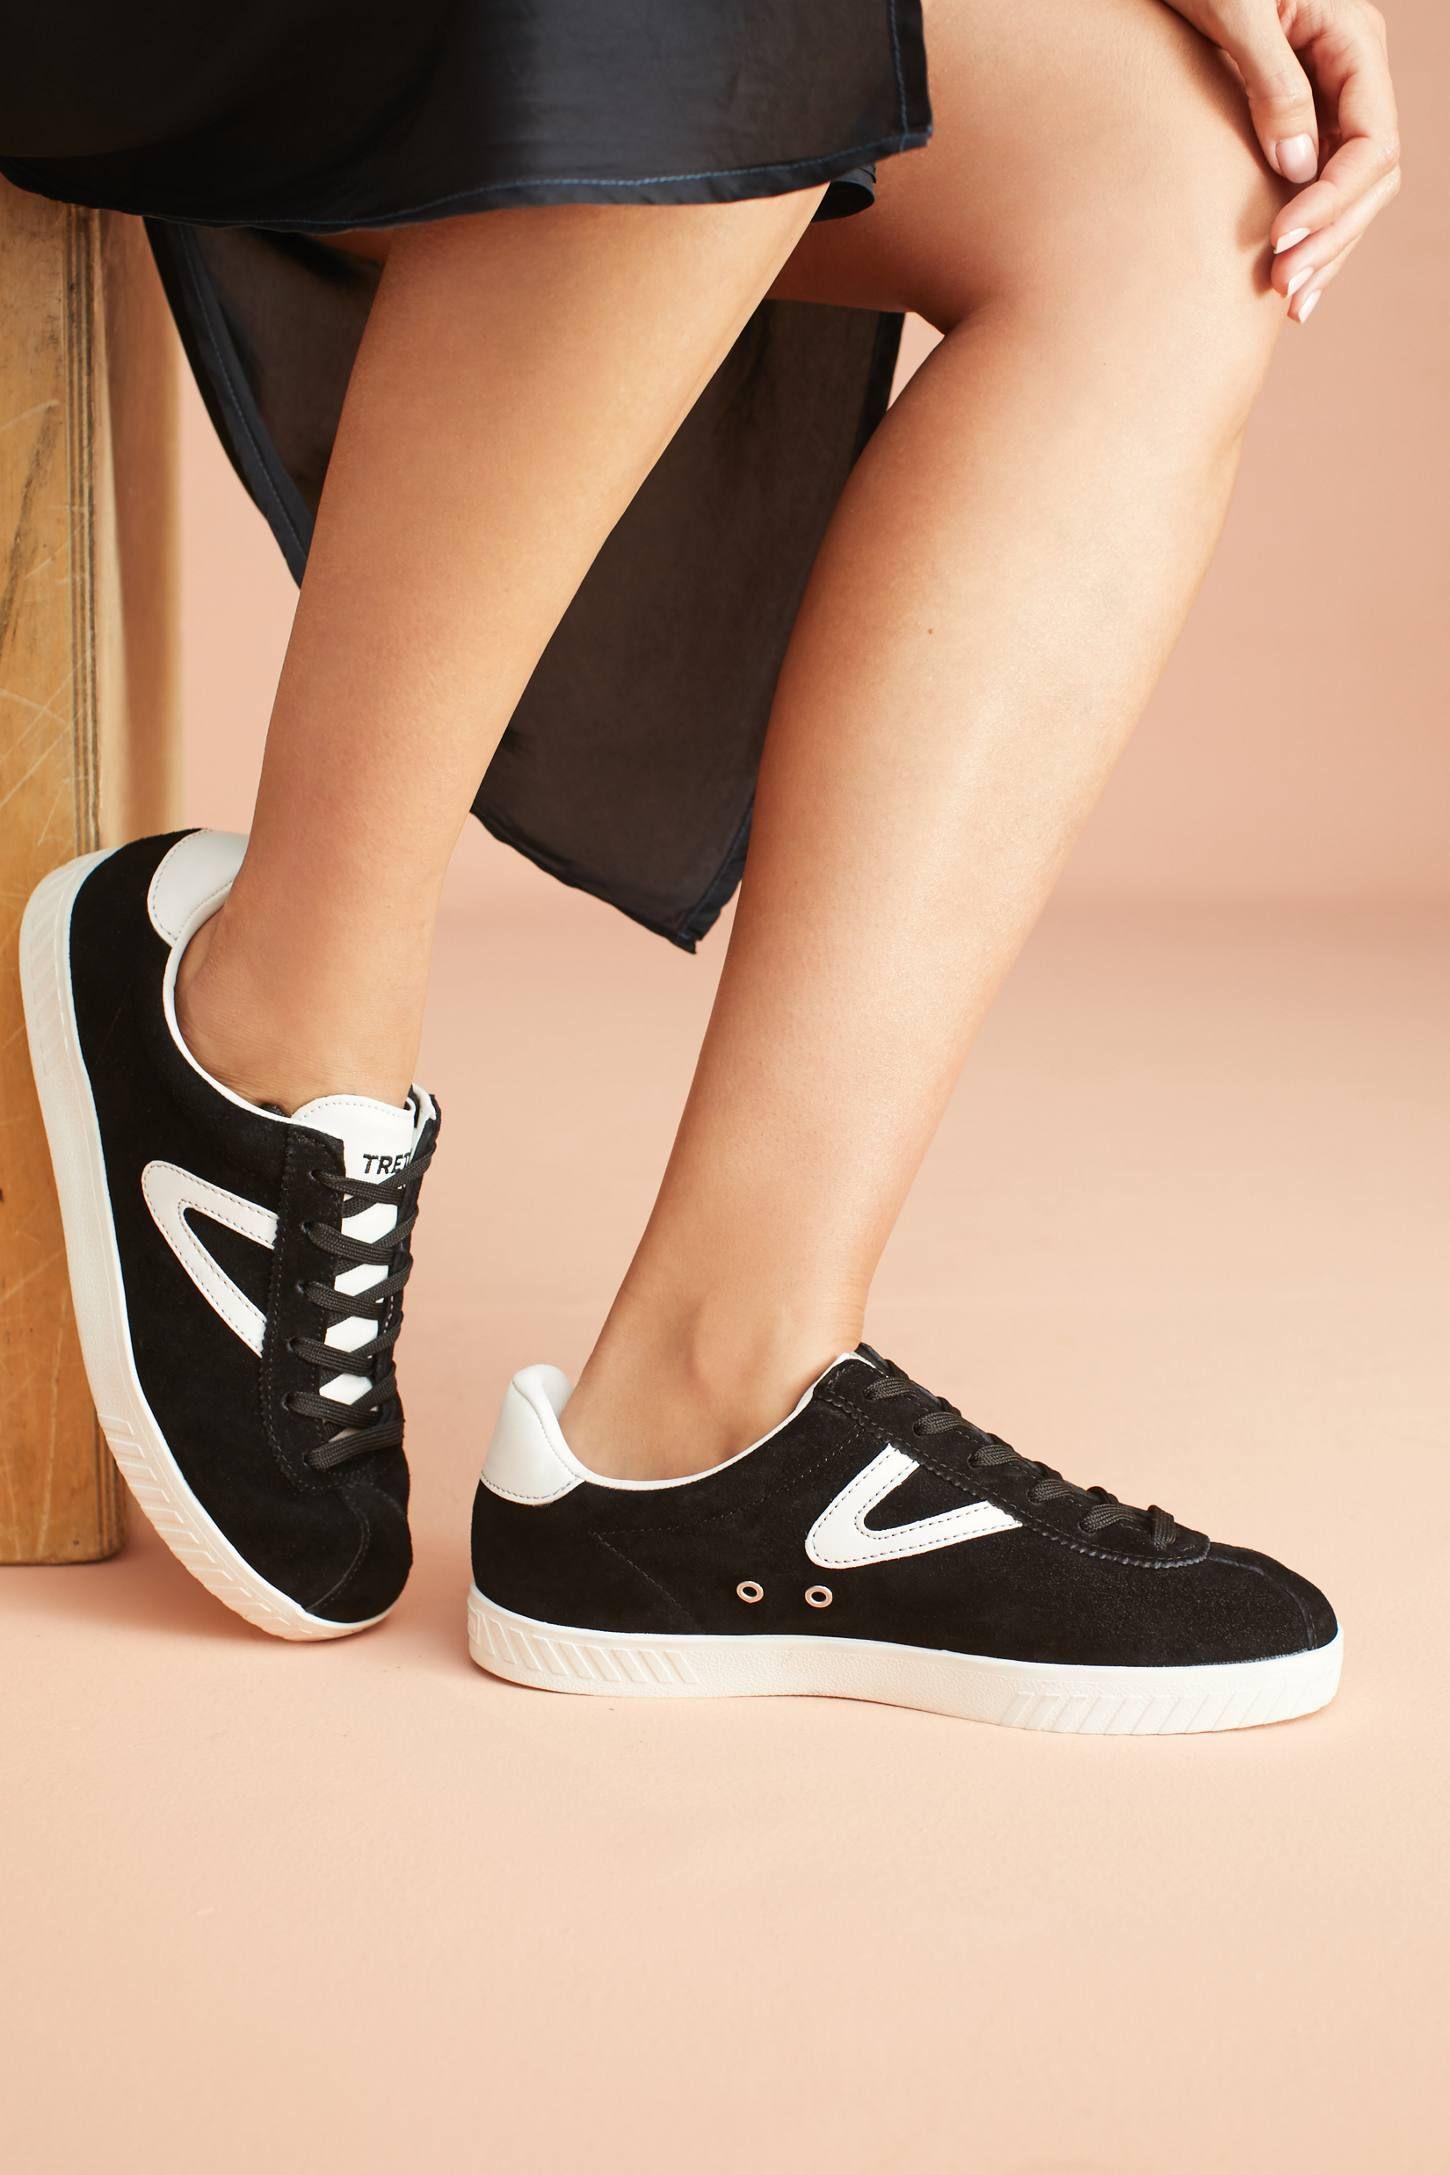 Tretorn Low Top Suede Sneakers